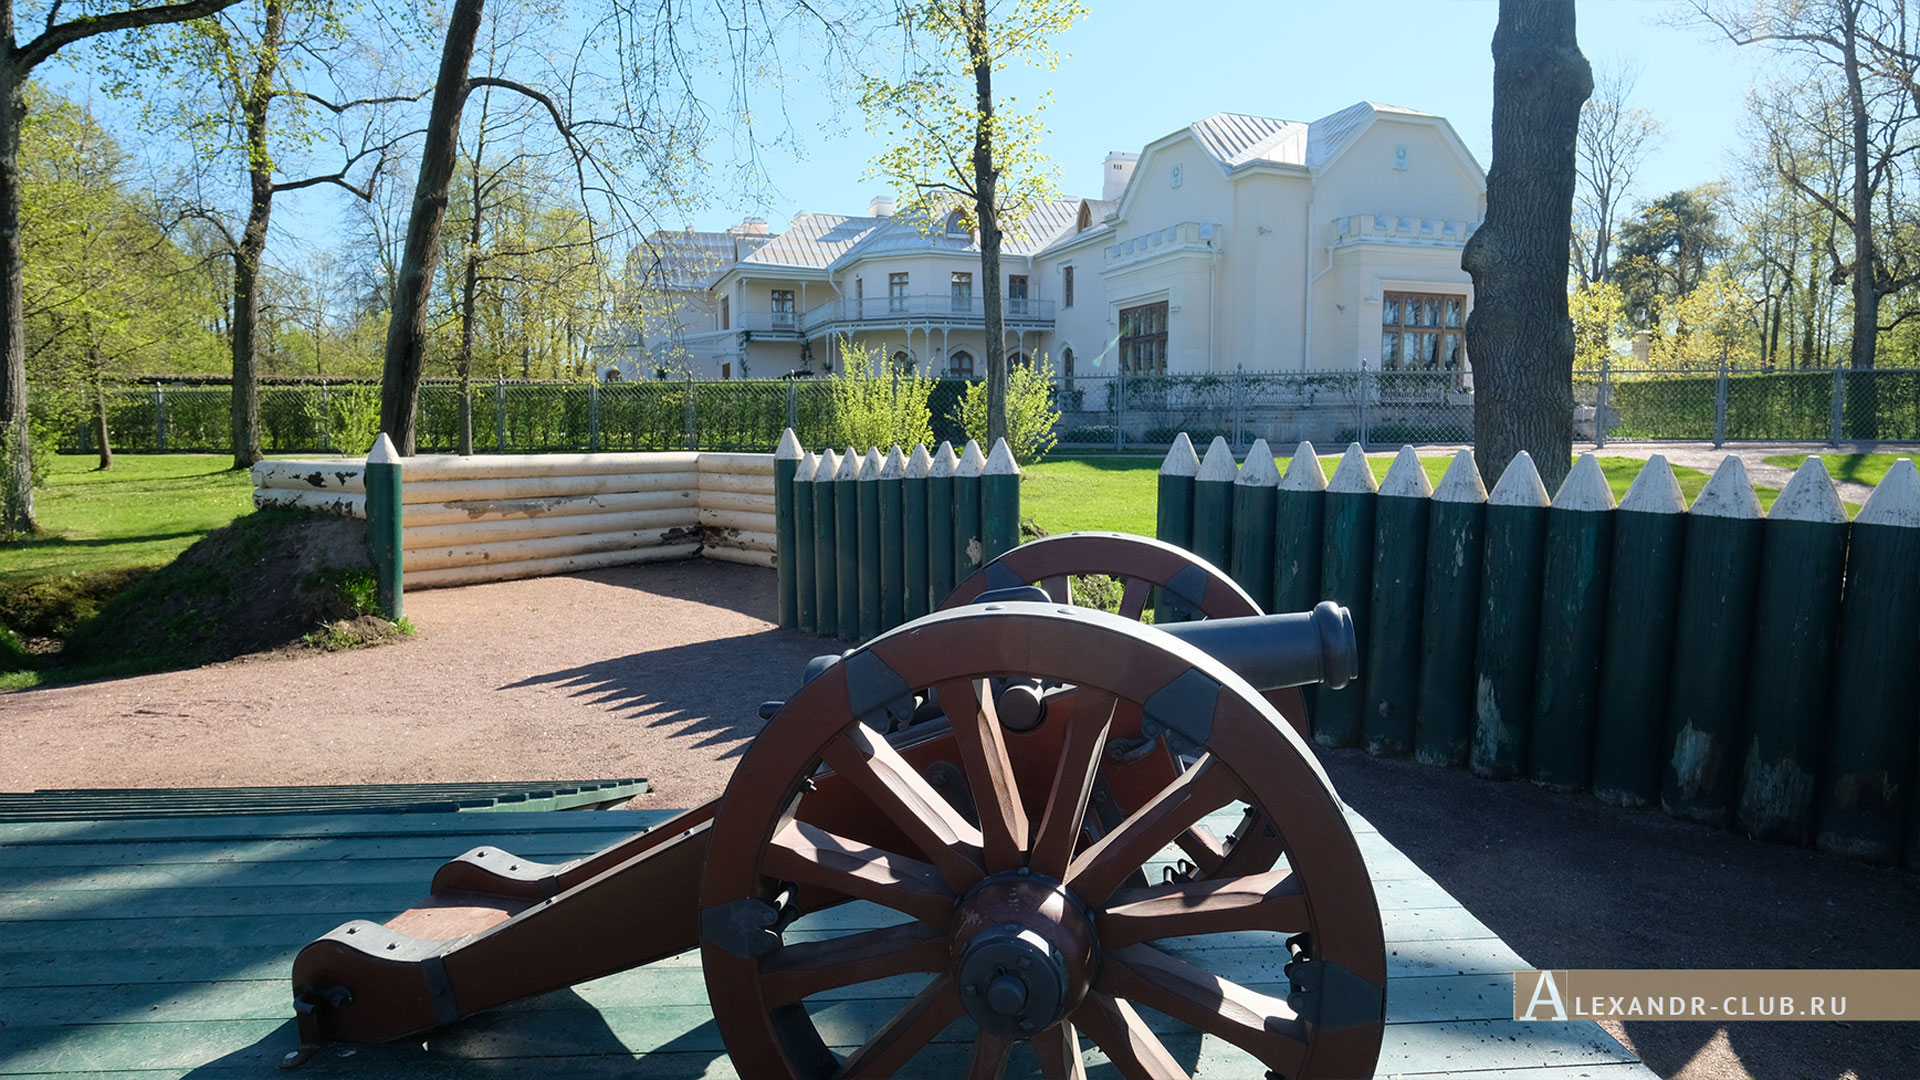 Петергоф, парк «Александрия», весна, редут, пушка, Фермерский дворец